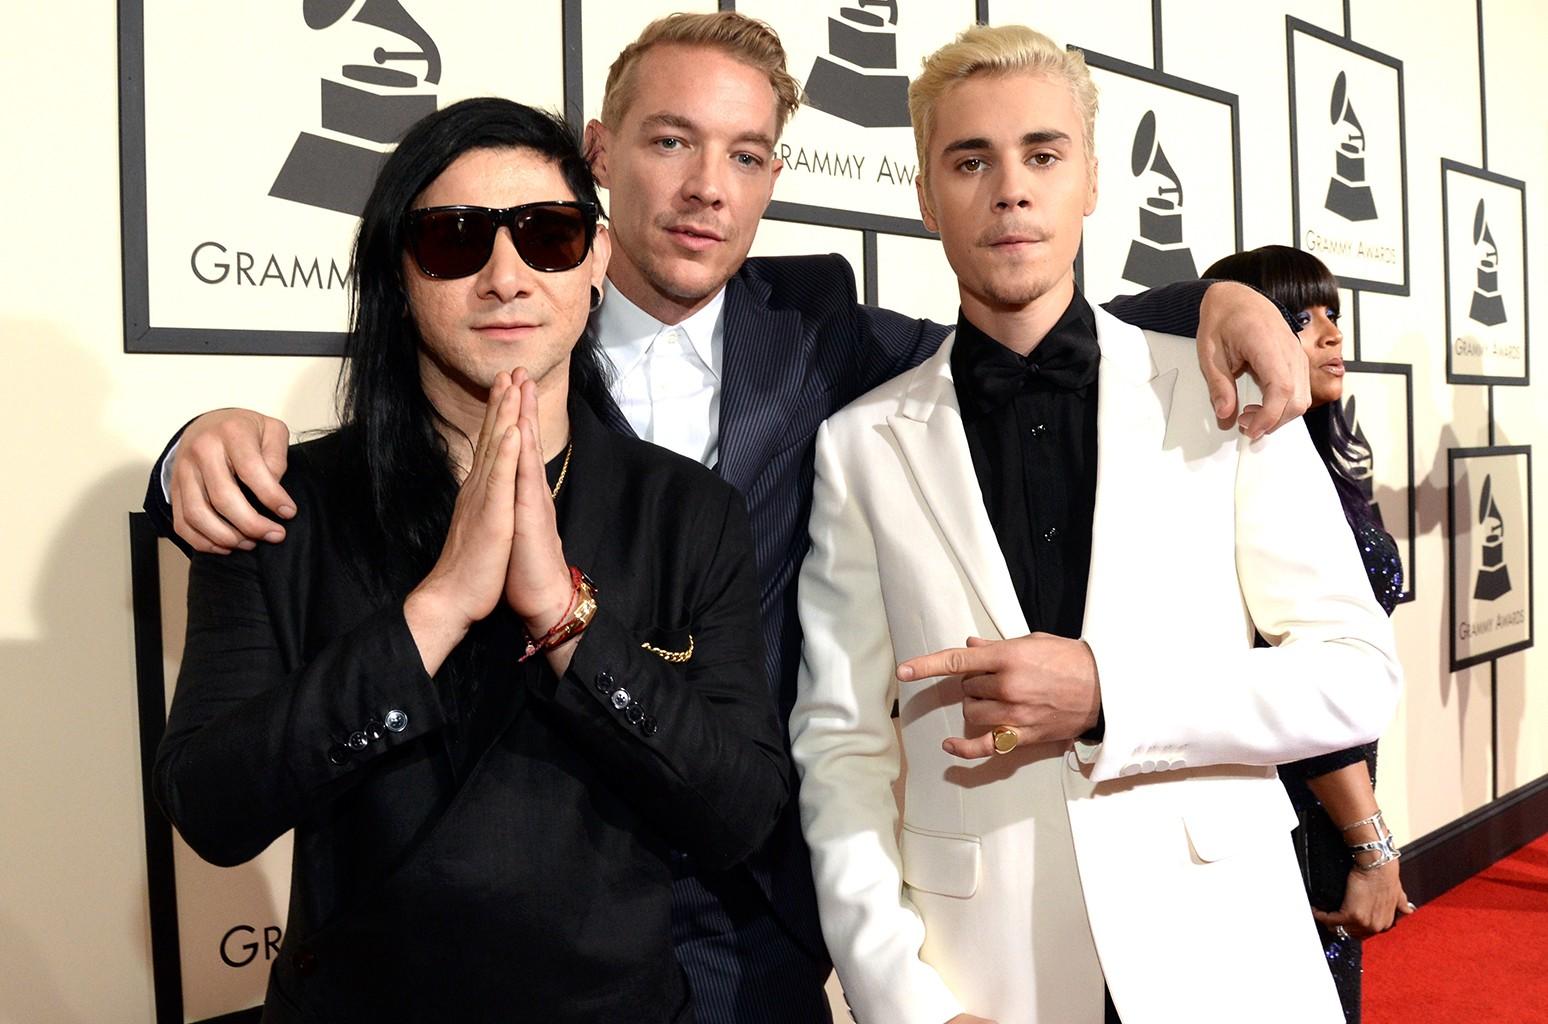 Skrillex, Diplo and Justin Bieber